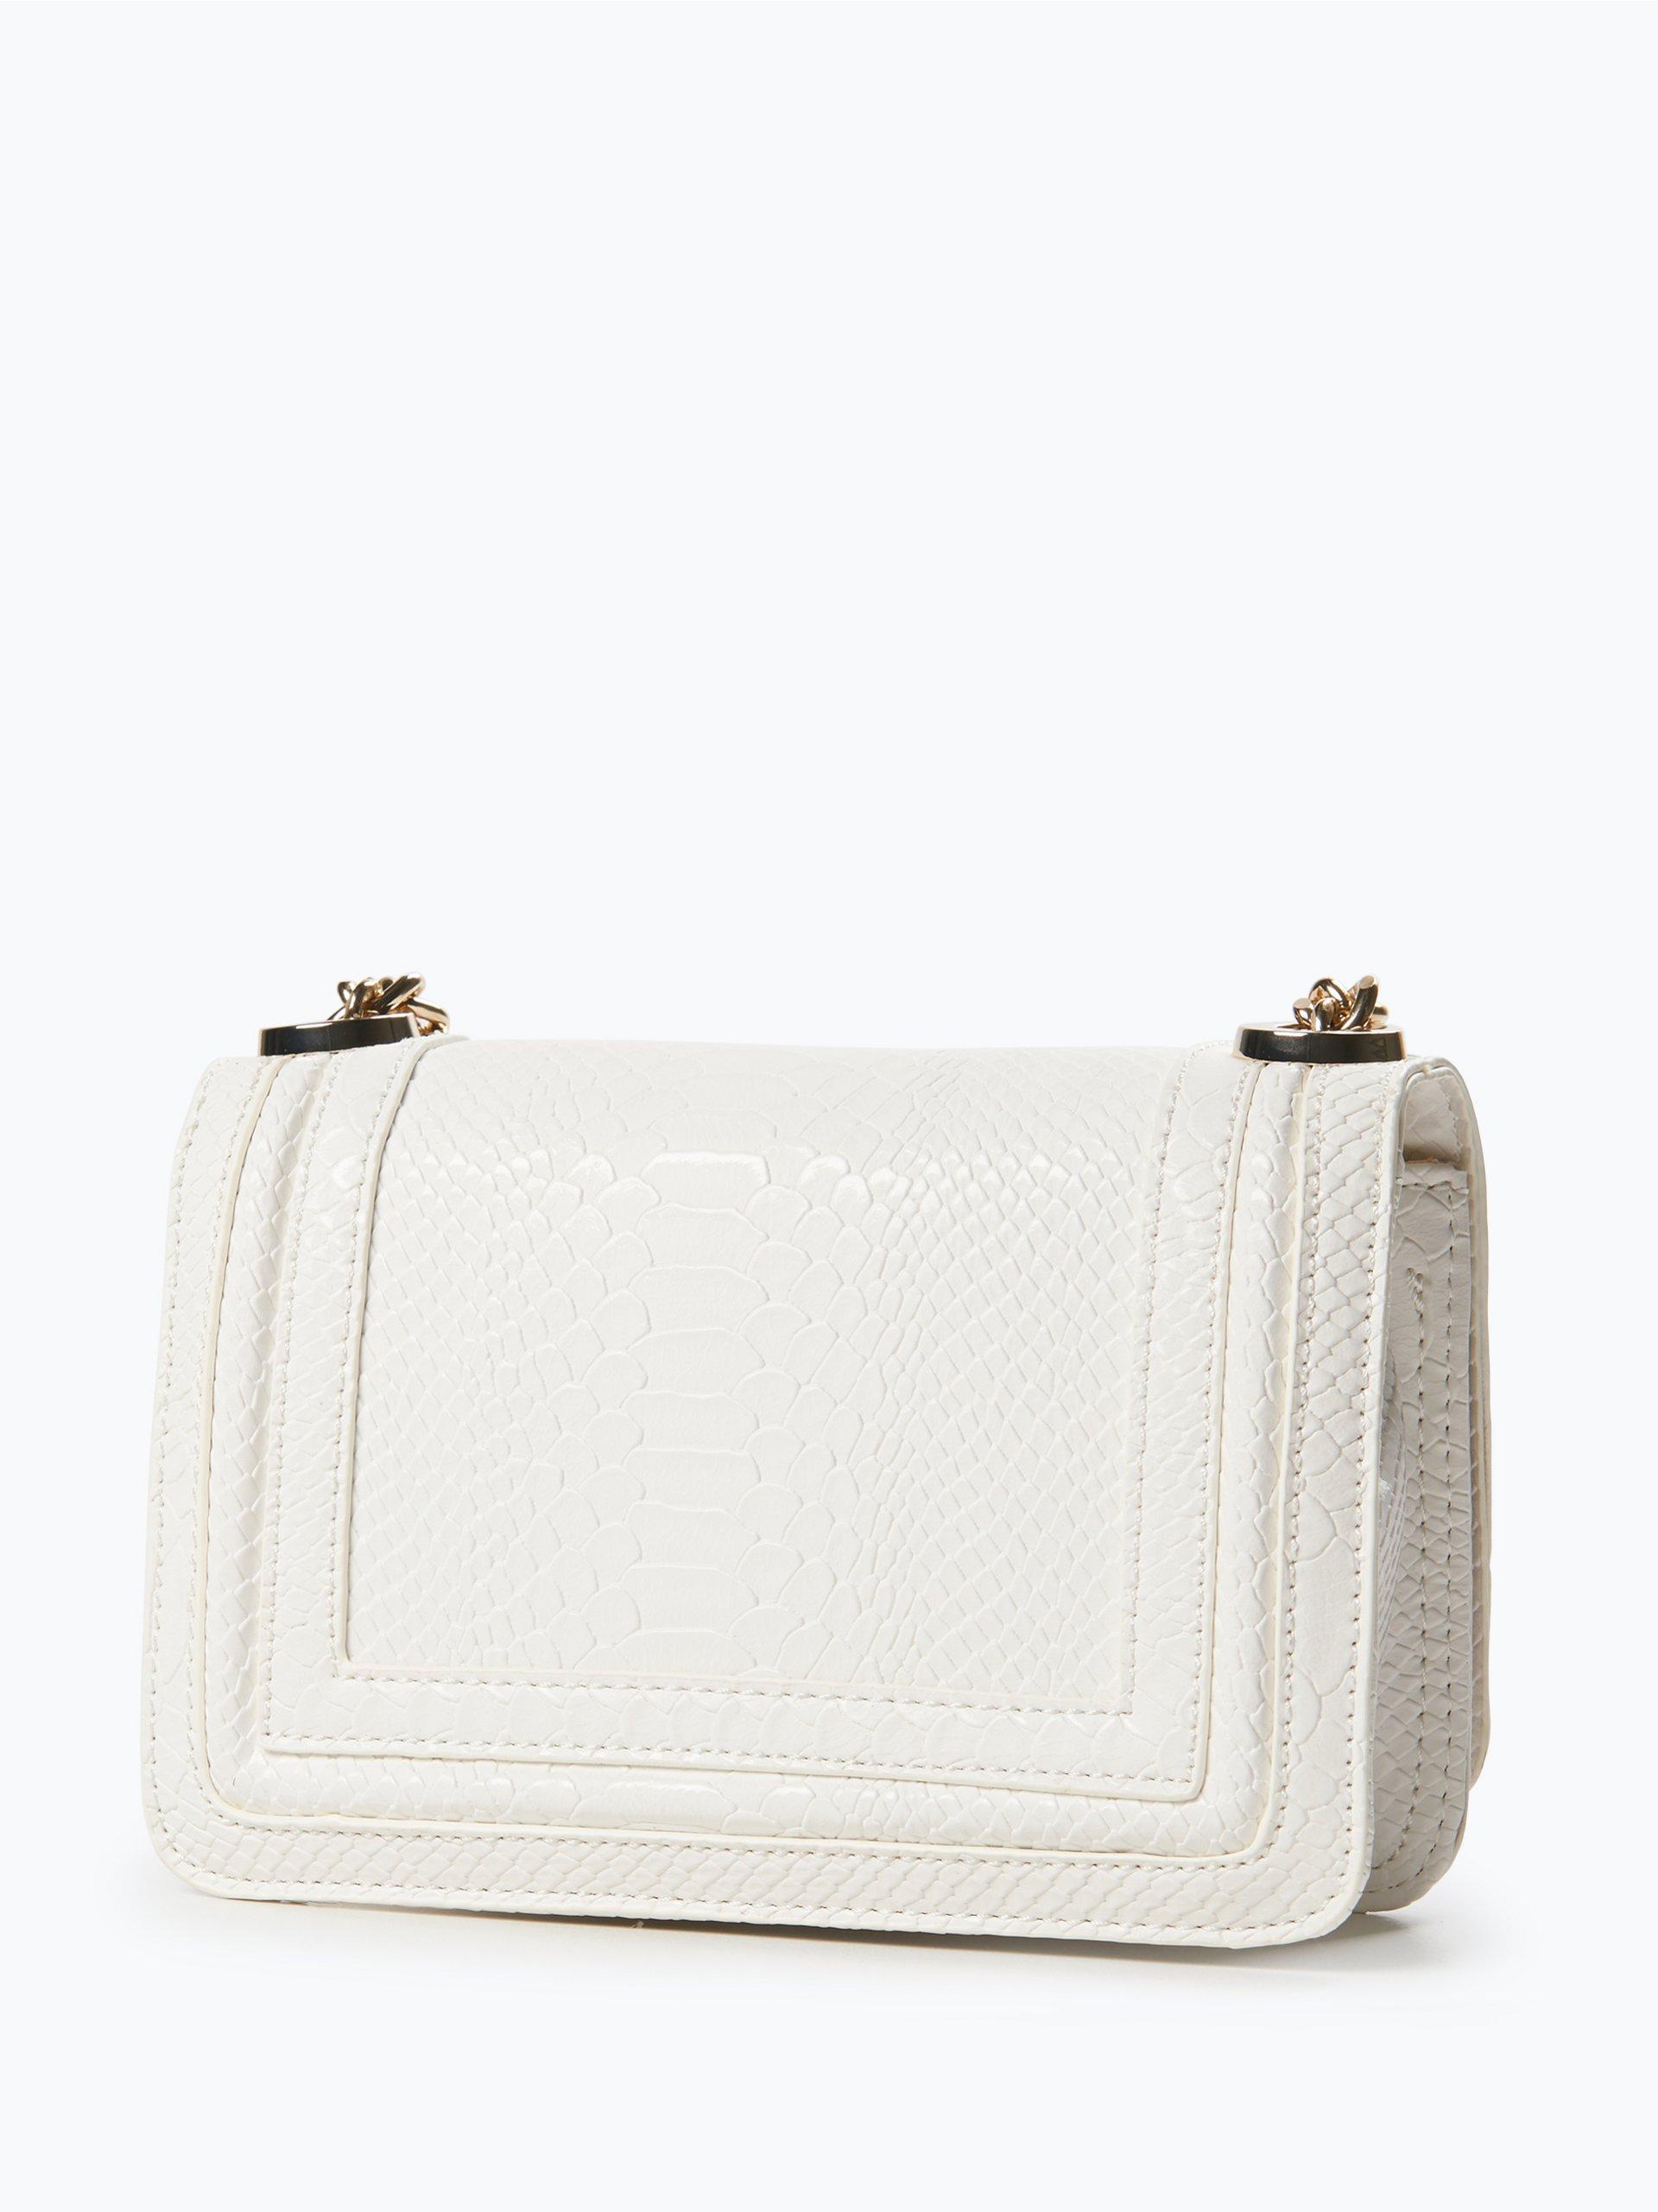 Valentino Damen Handtasche in Leder-Optik - Nerine